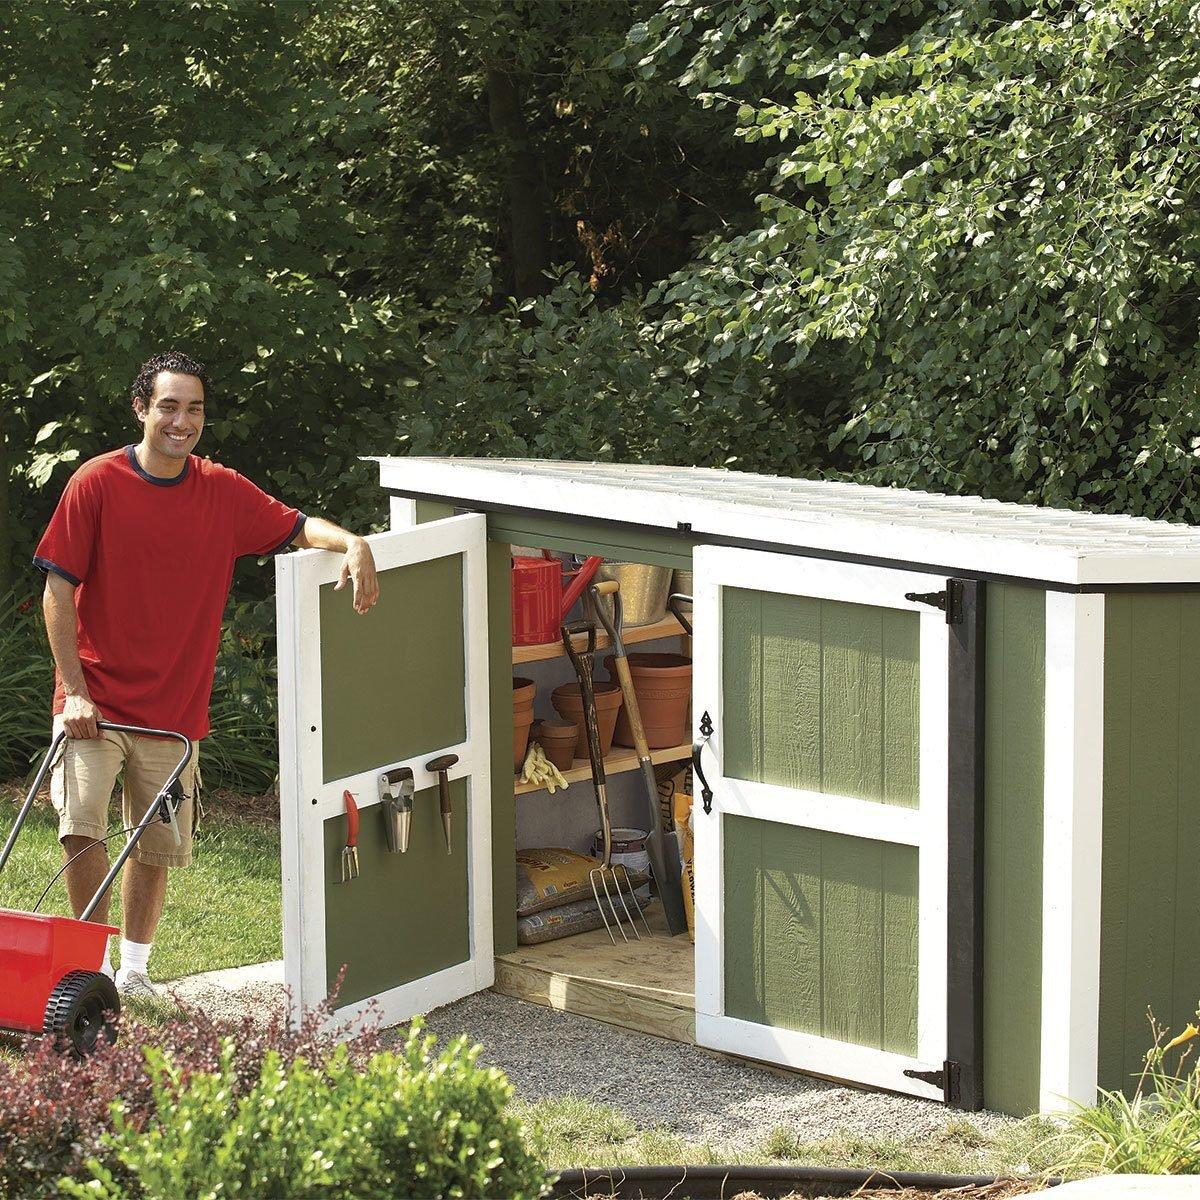 Storage No 2 Utility Storage: Garden Tool Storage Ideas